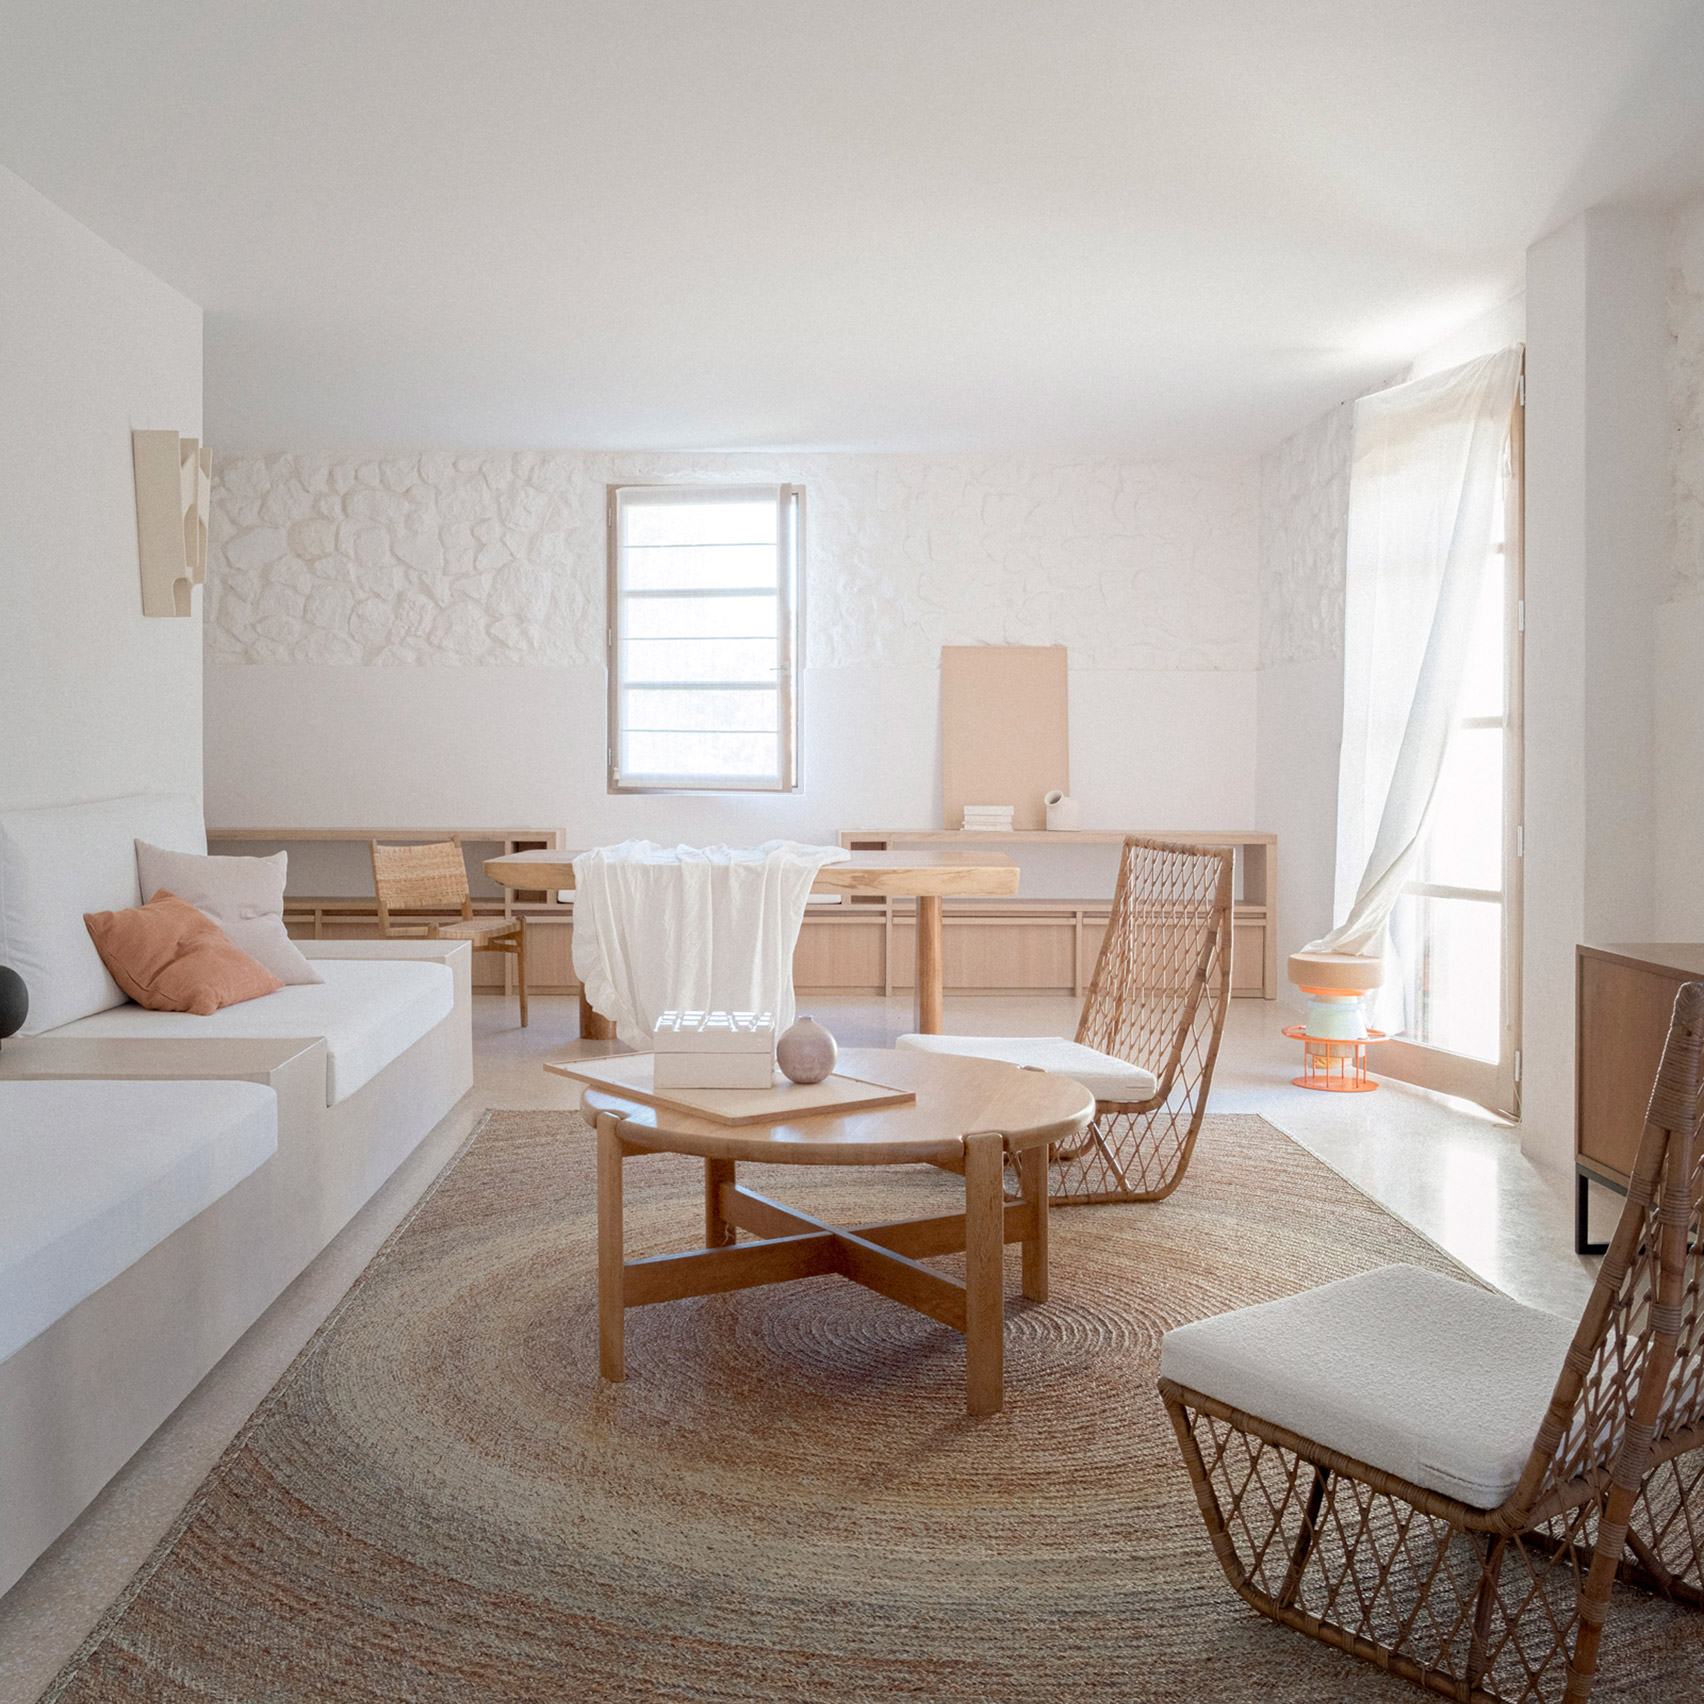 Dezeen's top home interiors of 2020: MA House by Timothee Mercier